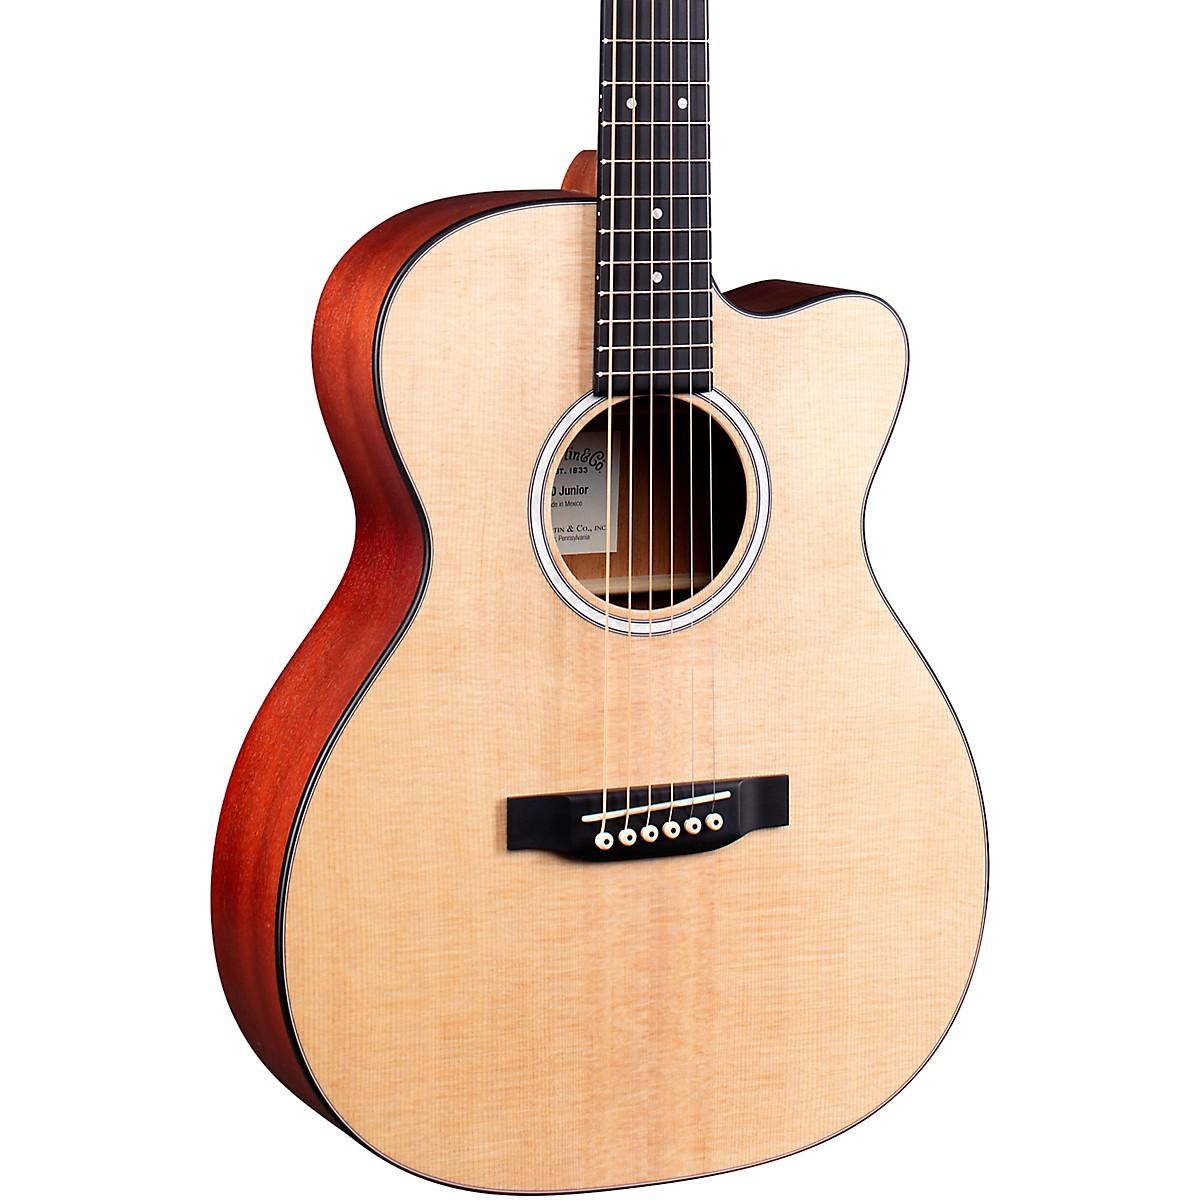 Martin 000 Jr-10E Auditorium Cutaway Acoustic-Electric Guitar